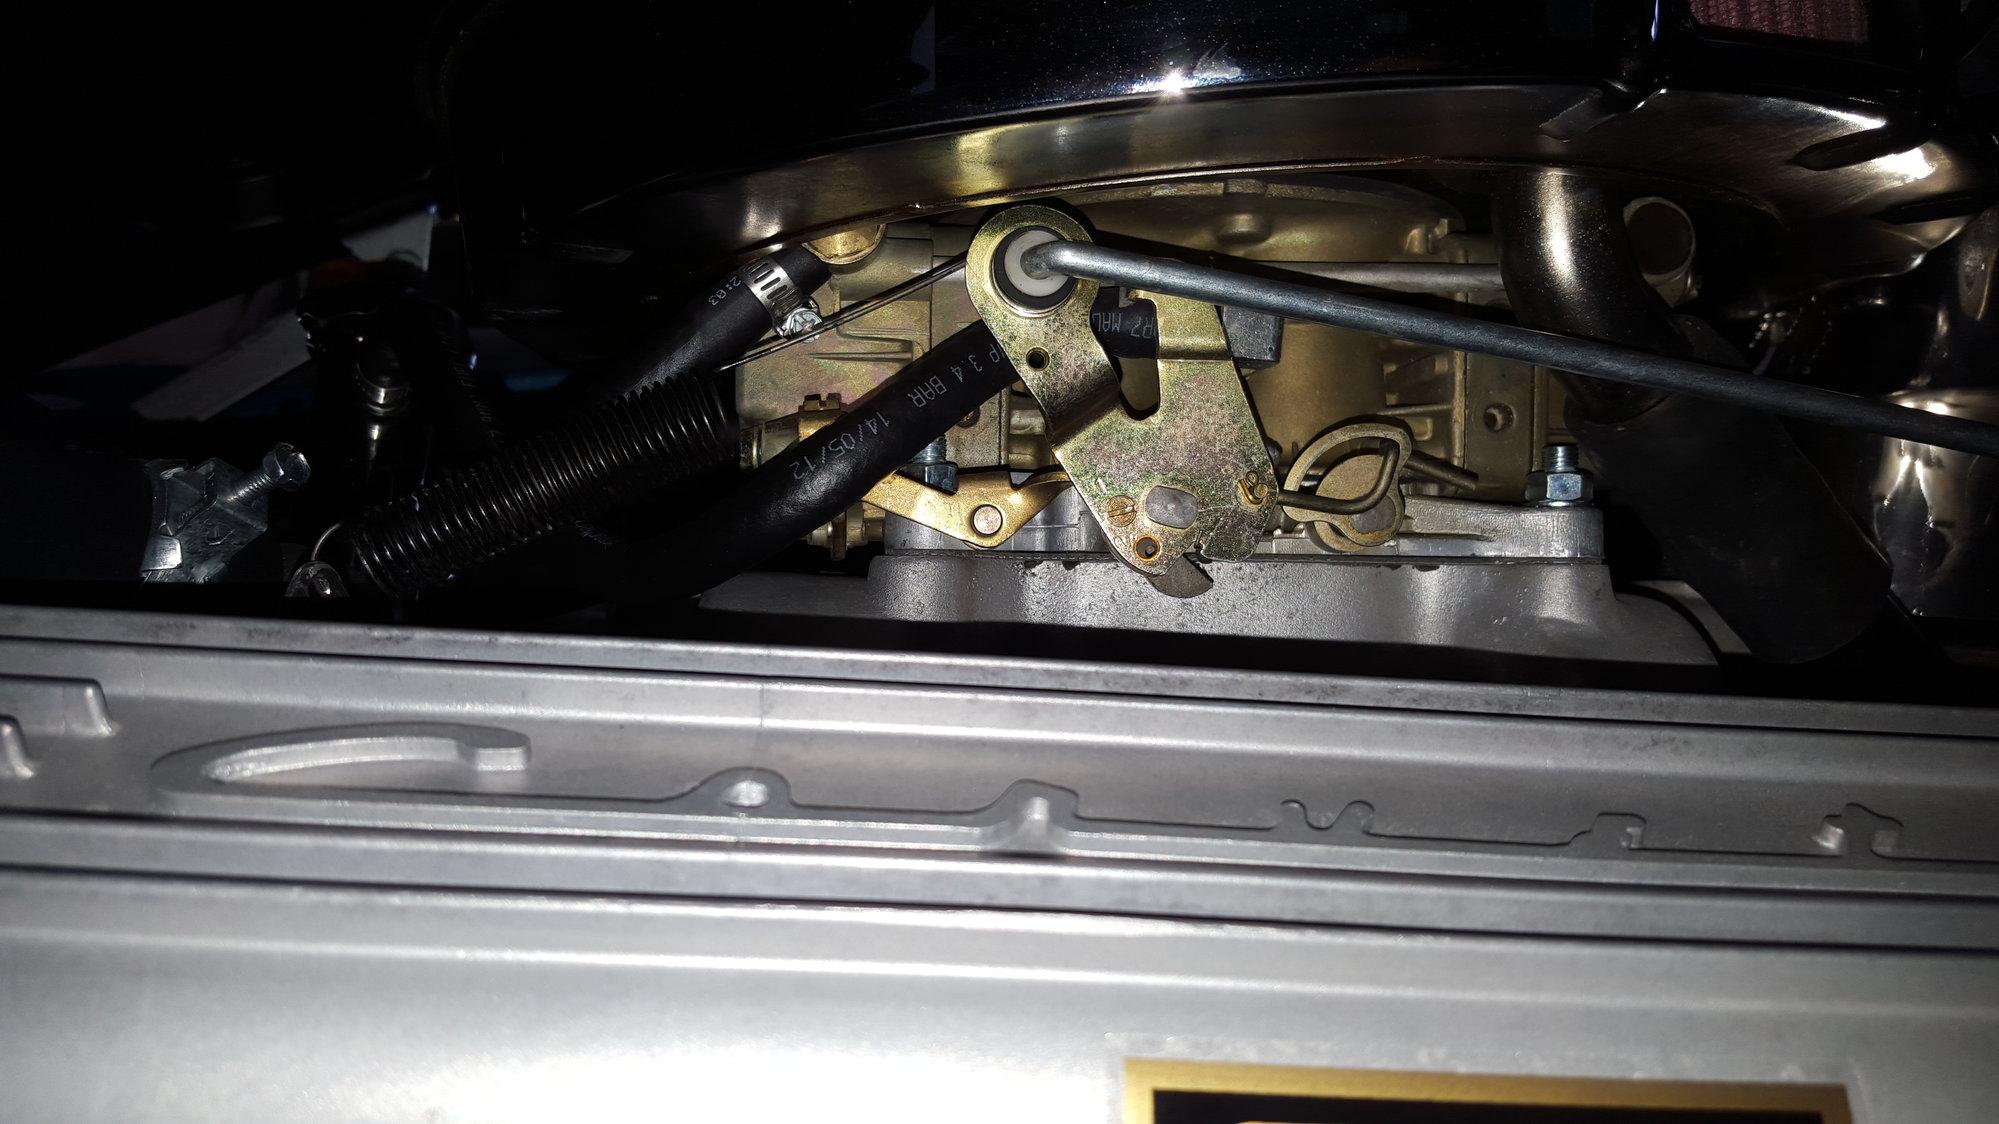 65' 396 Holley Carburetor stuck on wide open throttle :O